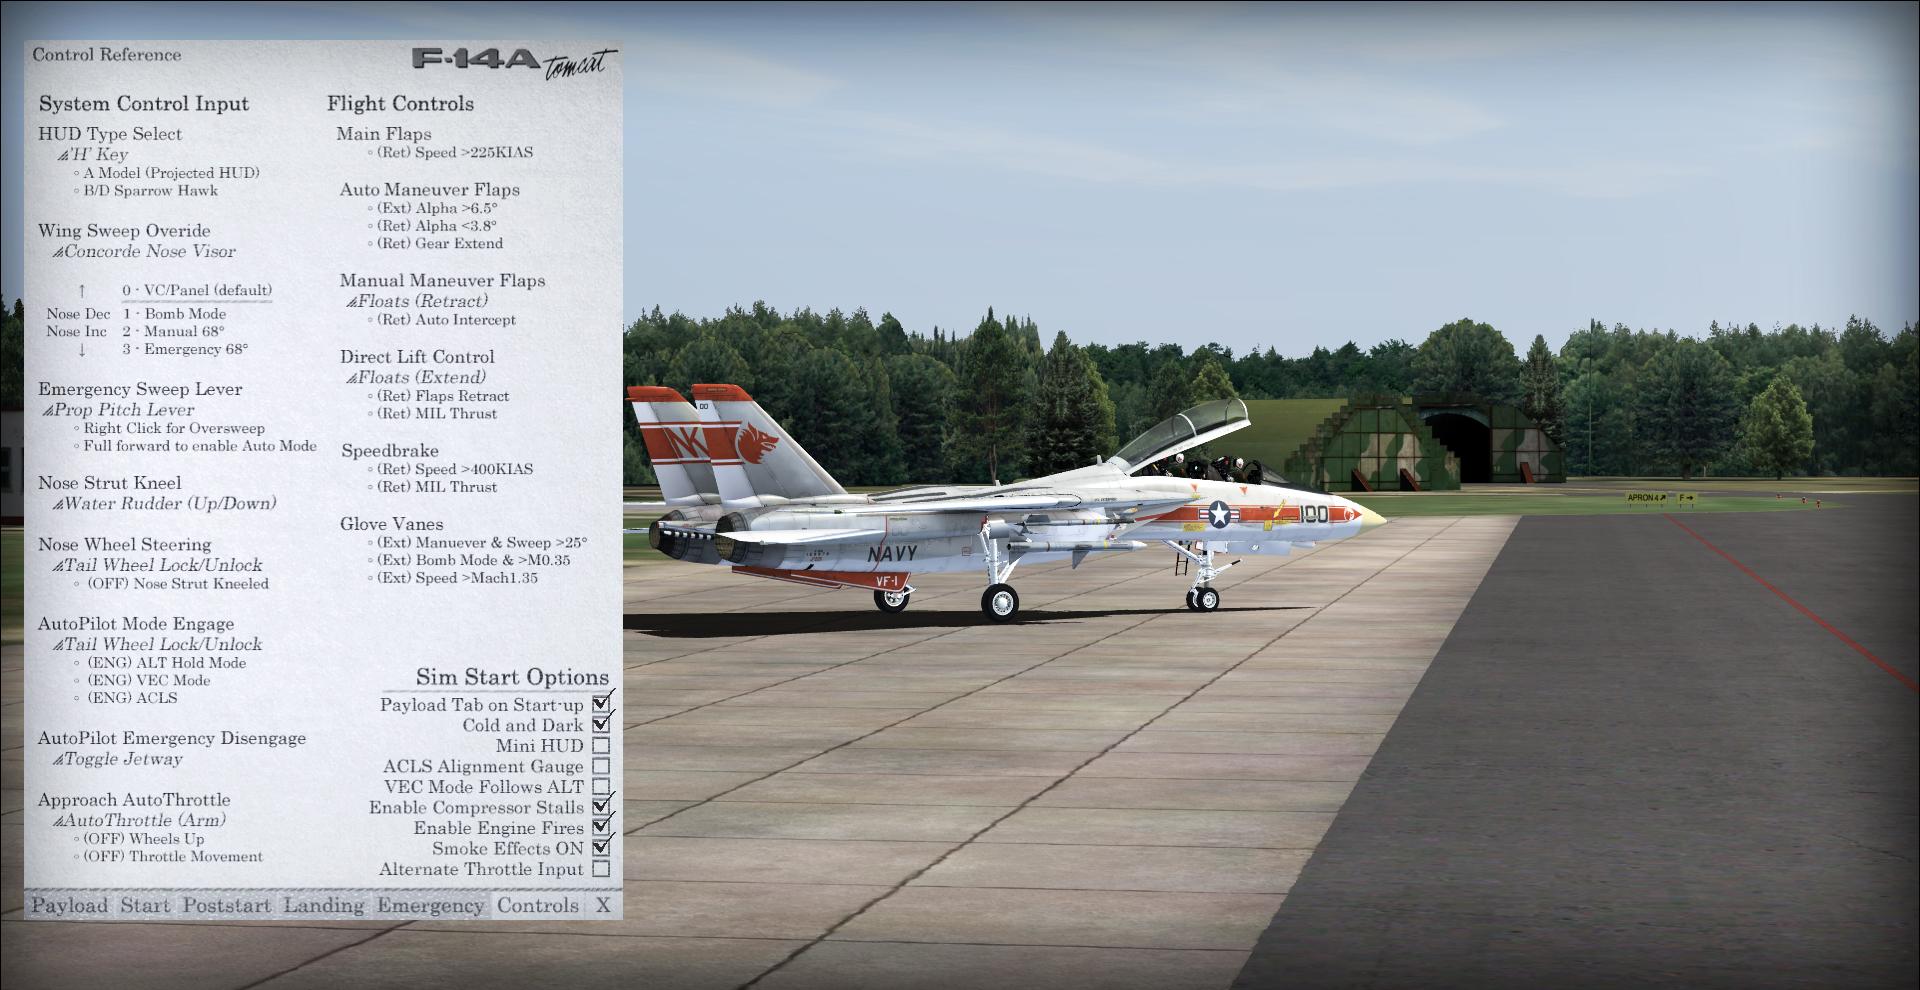 Aerosoft F-14 X - review (6*) - startup and flight • C-Aviation